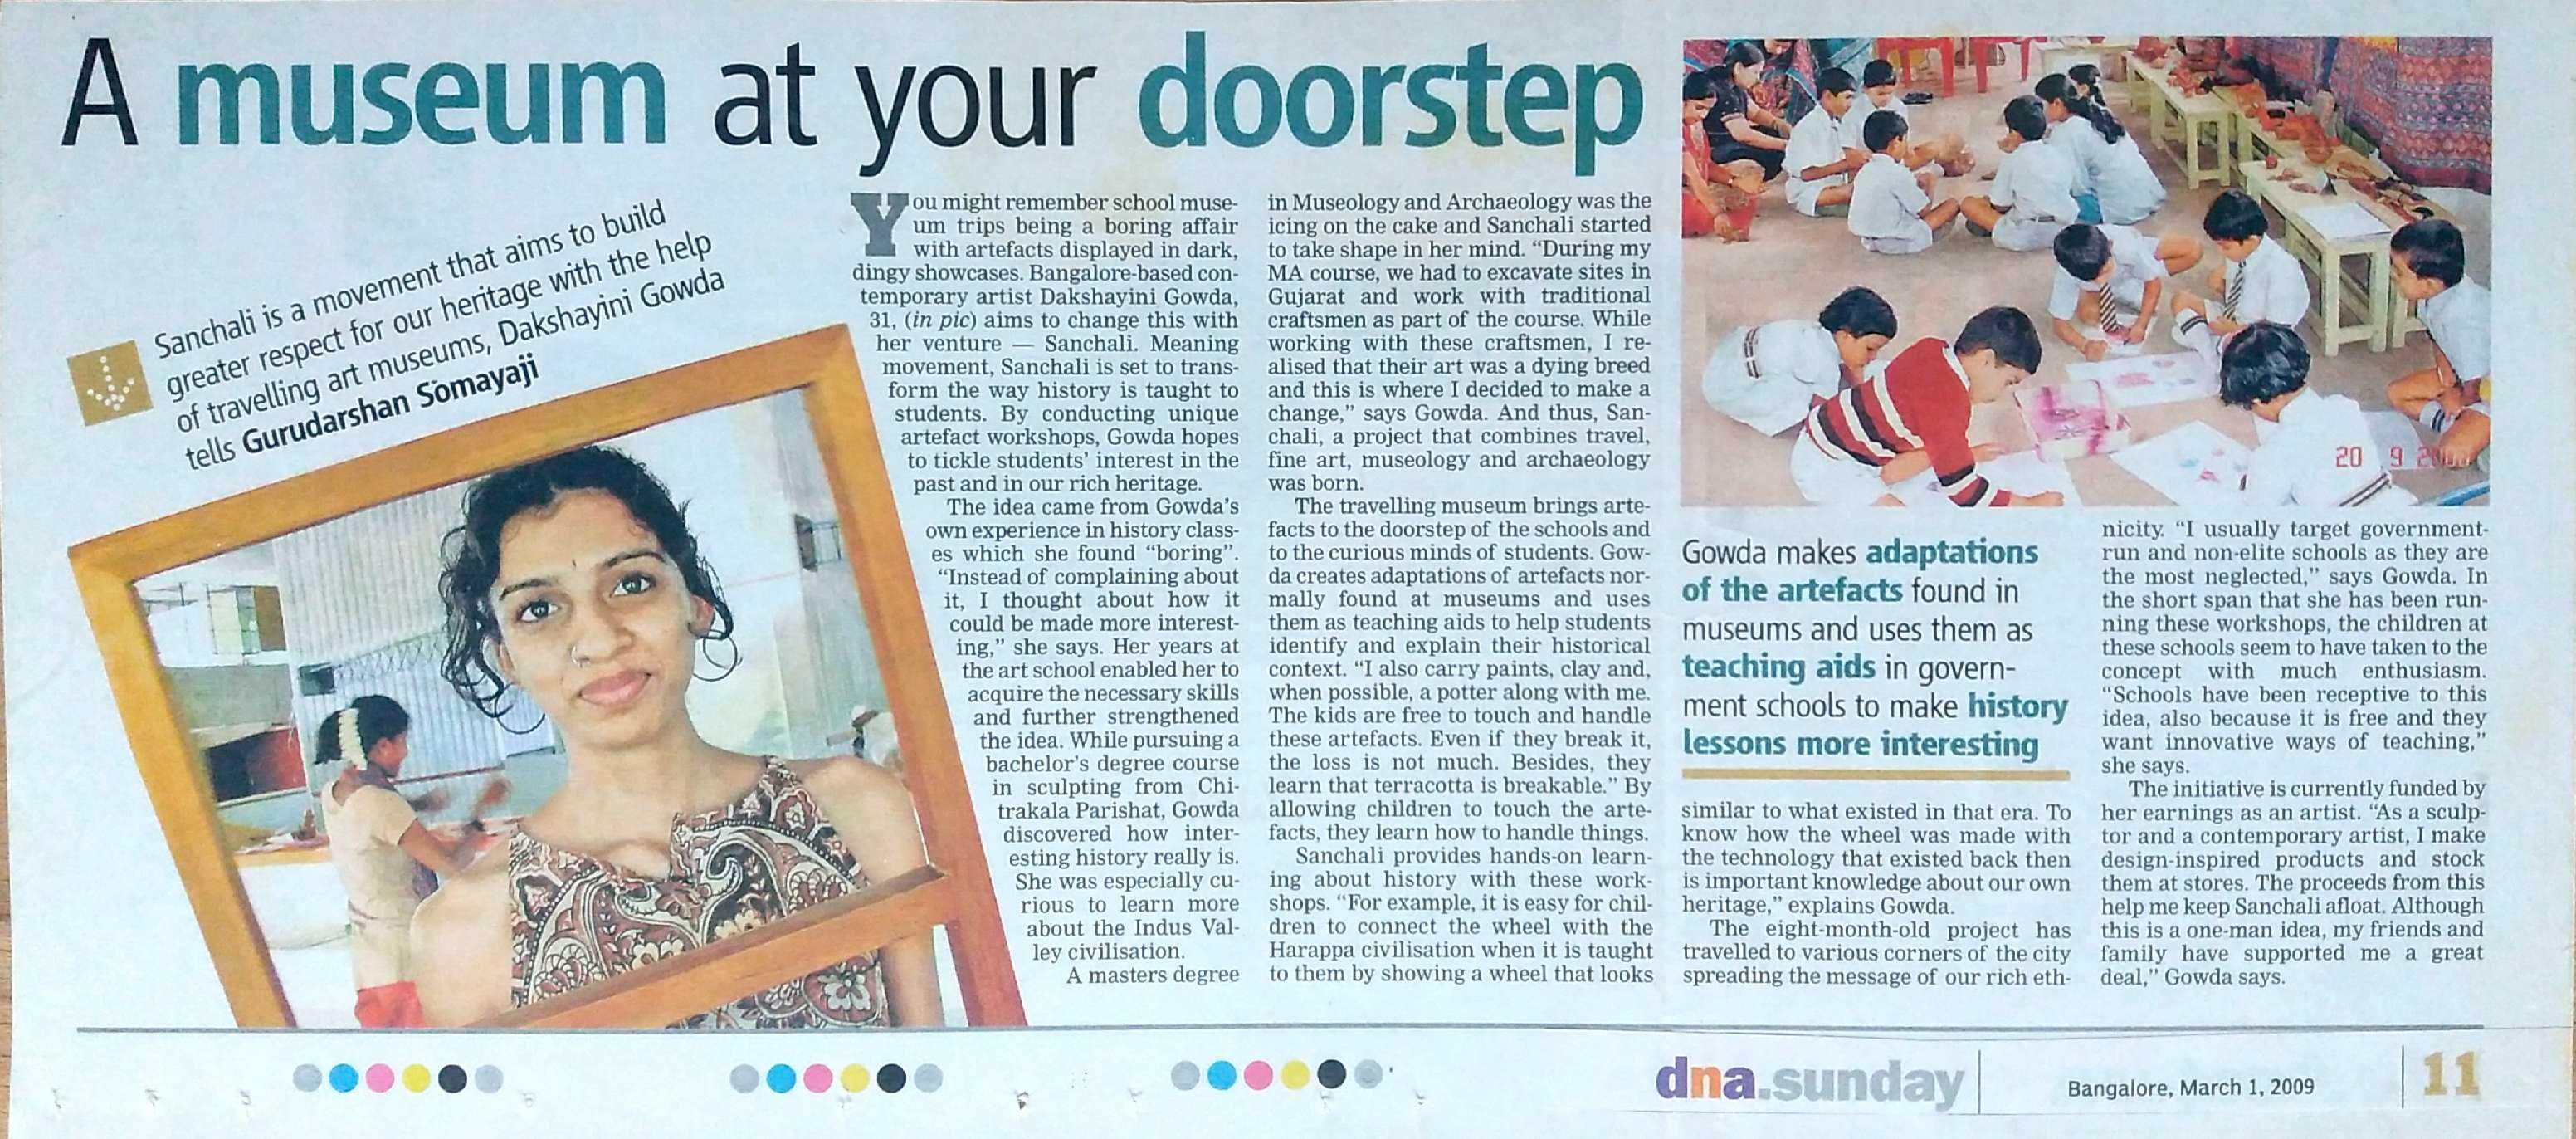 DNA SUNDAY Newspaper, 2009